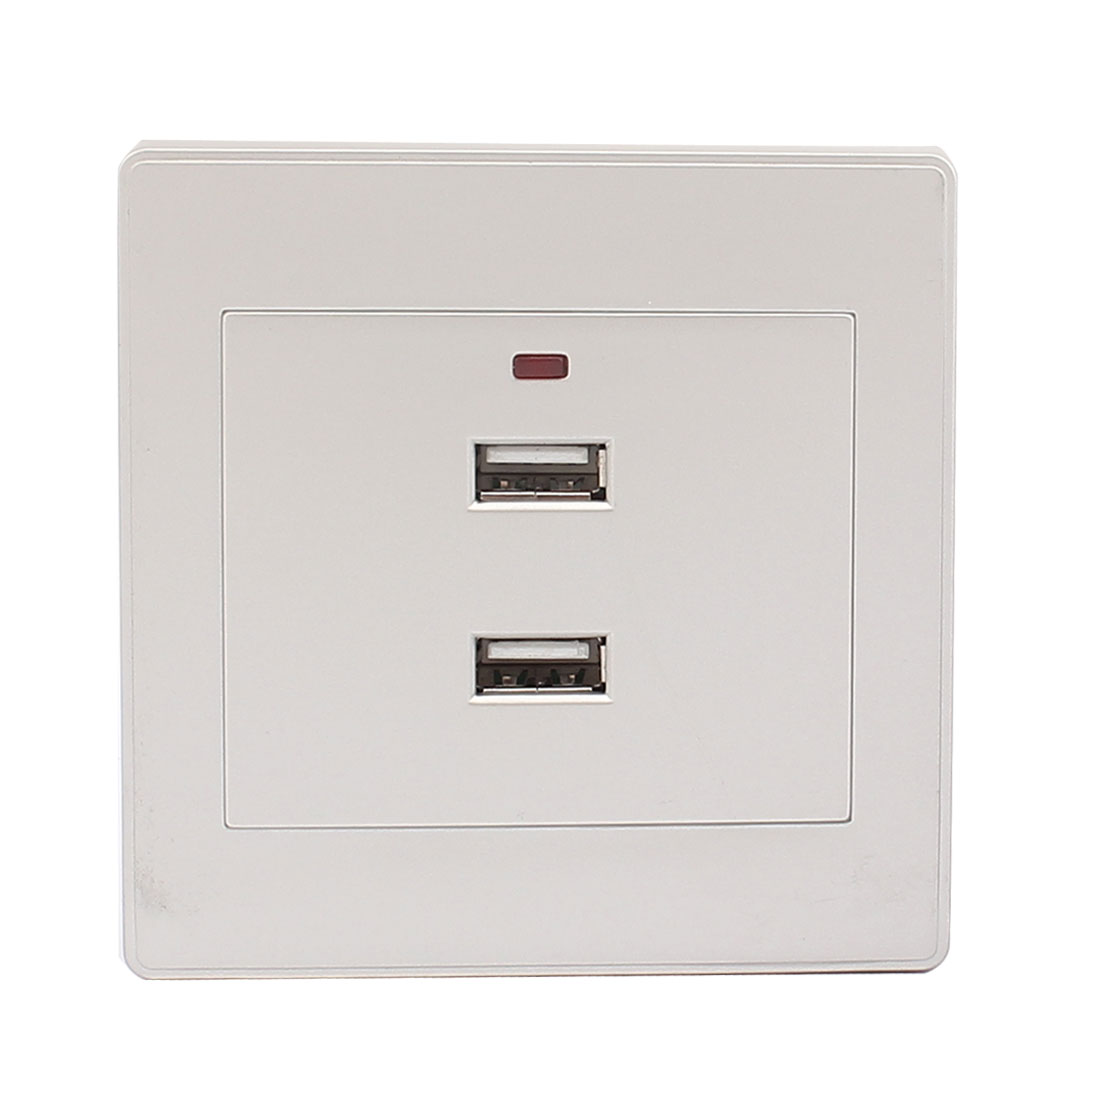 AC 220V-250V 2 USB Ports Charging DC 5V 2100mA Red Light Power Supply Wall Plate